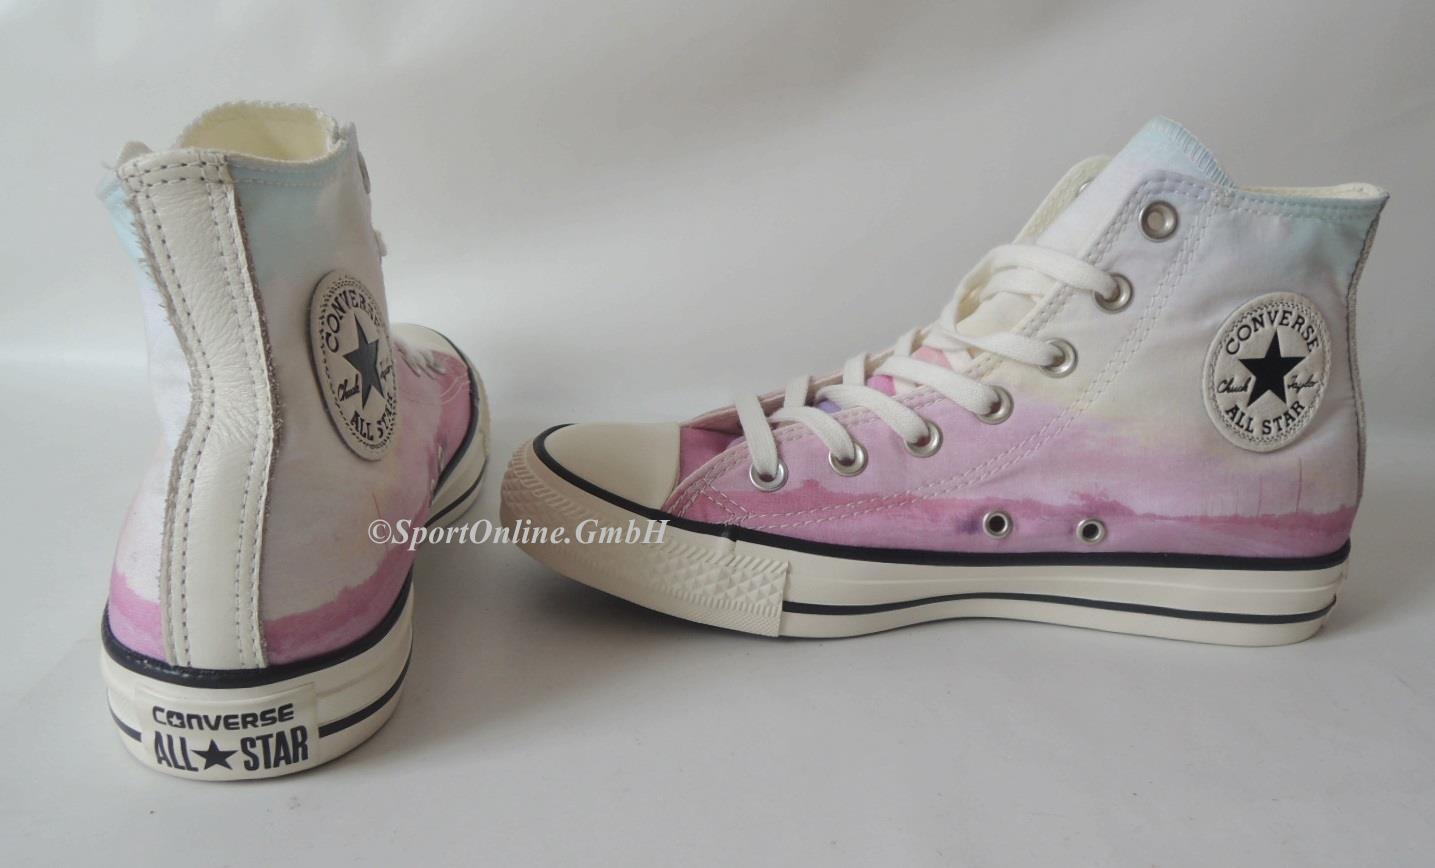 NEU Converse Chuck Taylor All Star Hi Graphic 39 Chucks Schuhe Sneaker 551629C